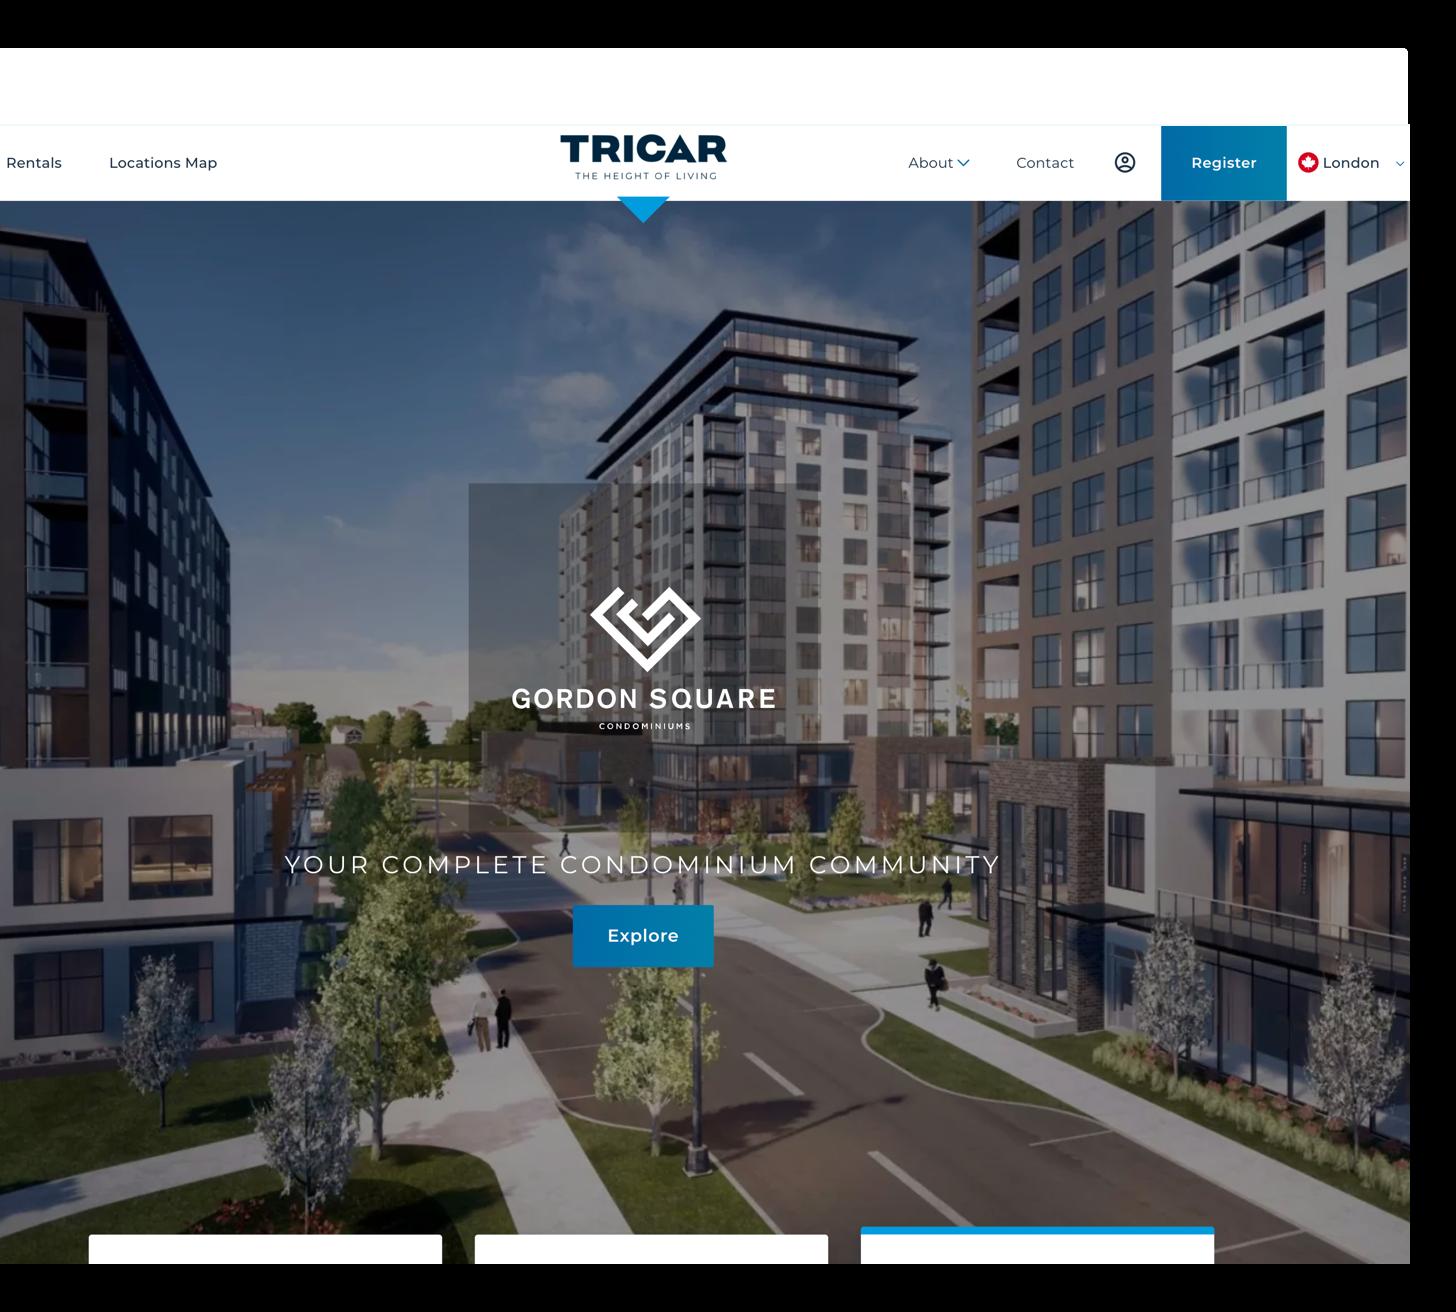 Tricar Main Page